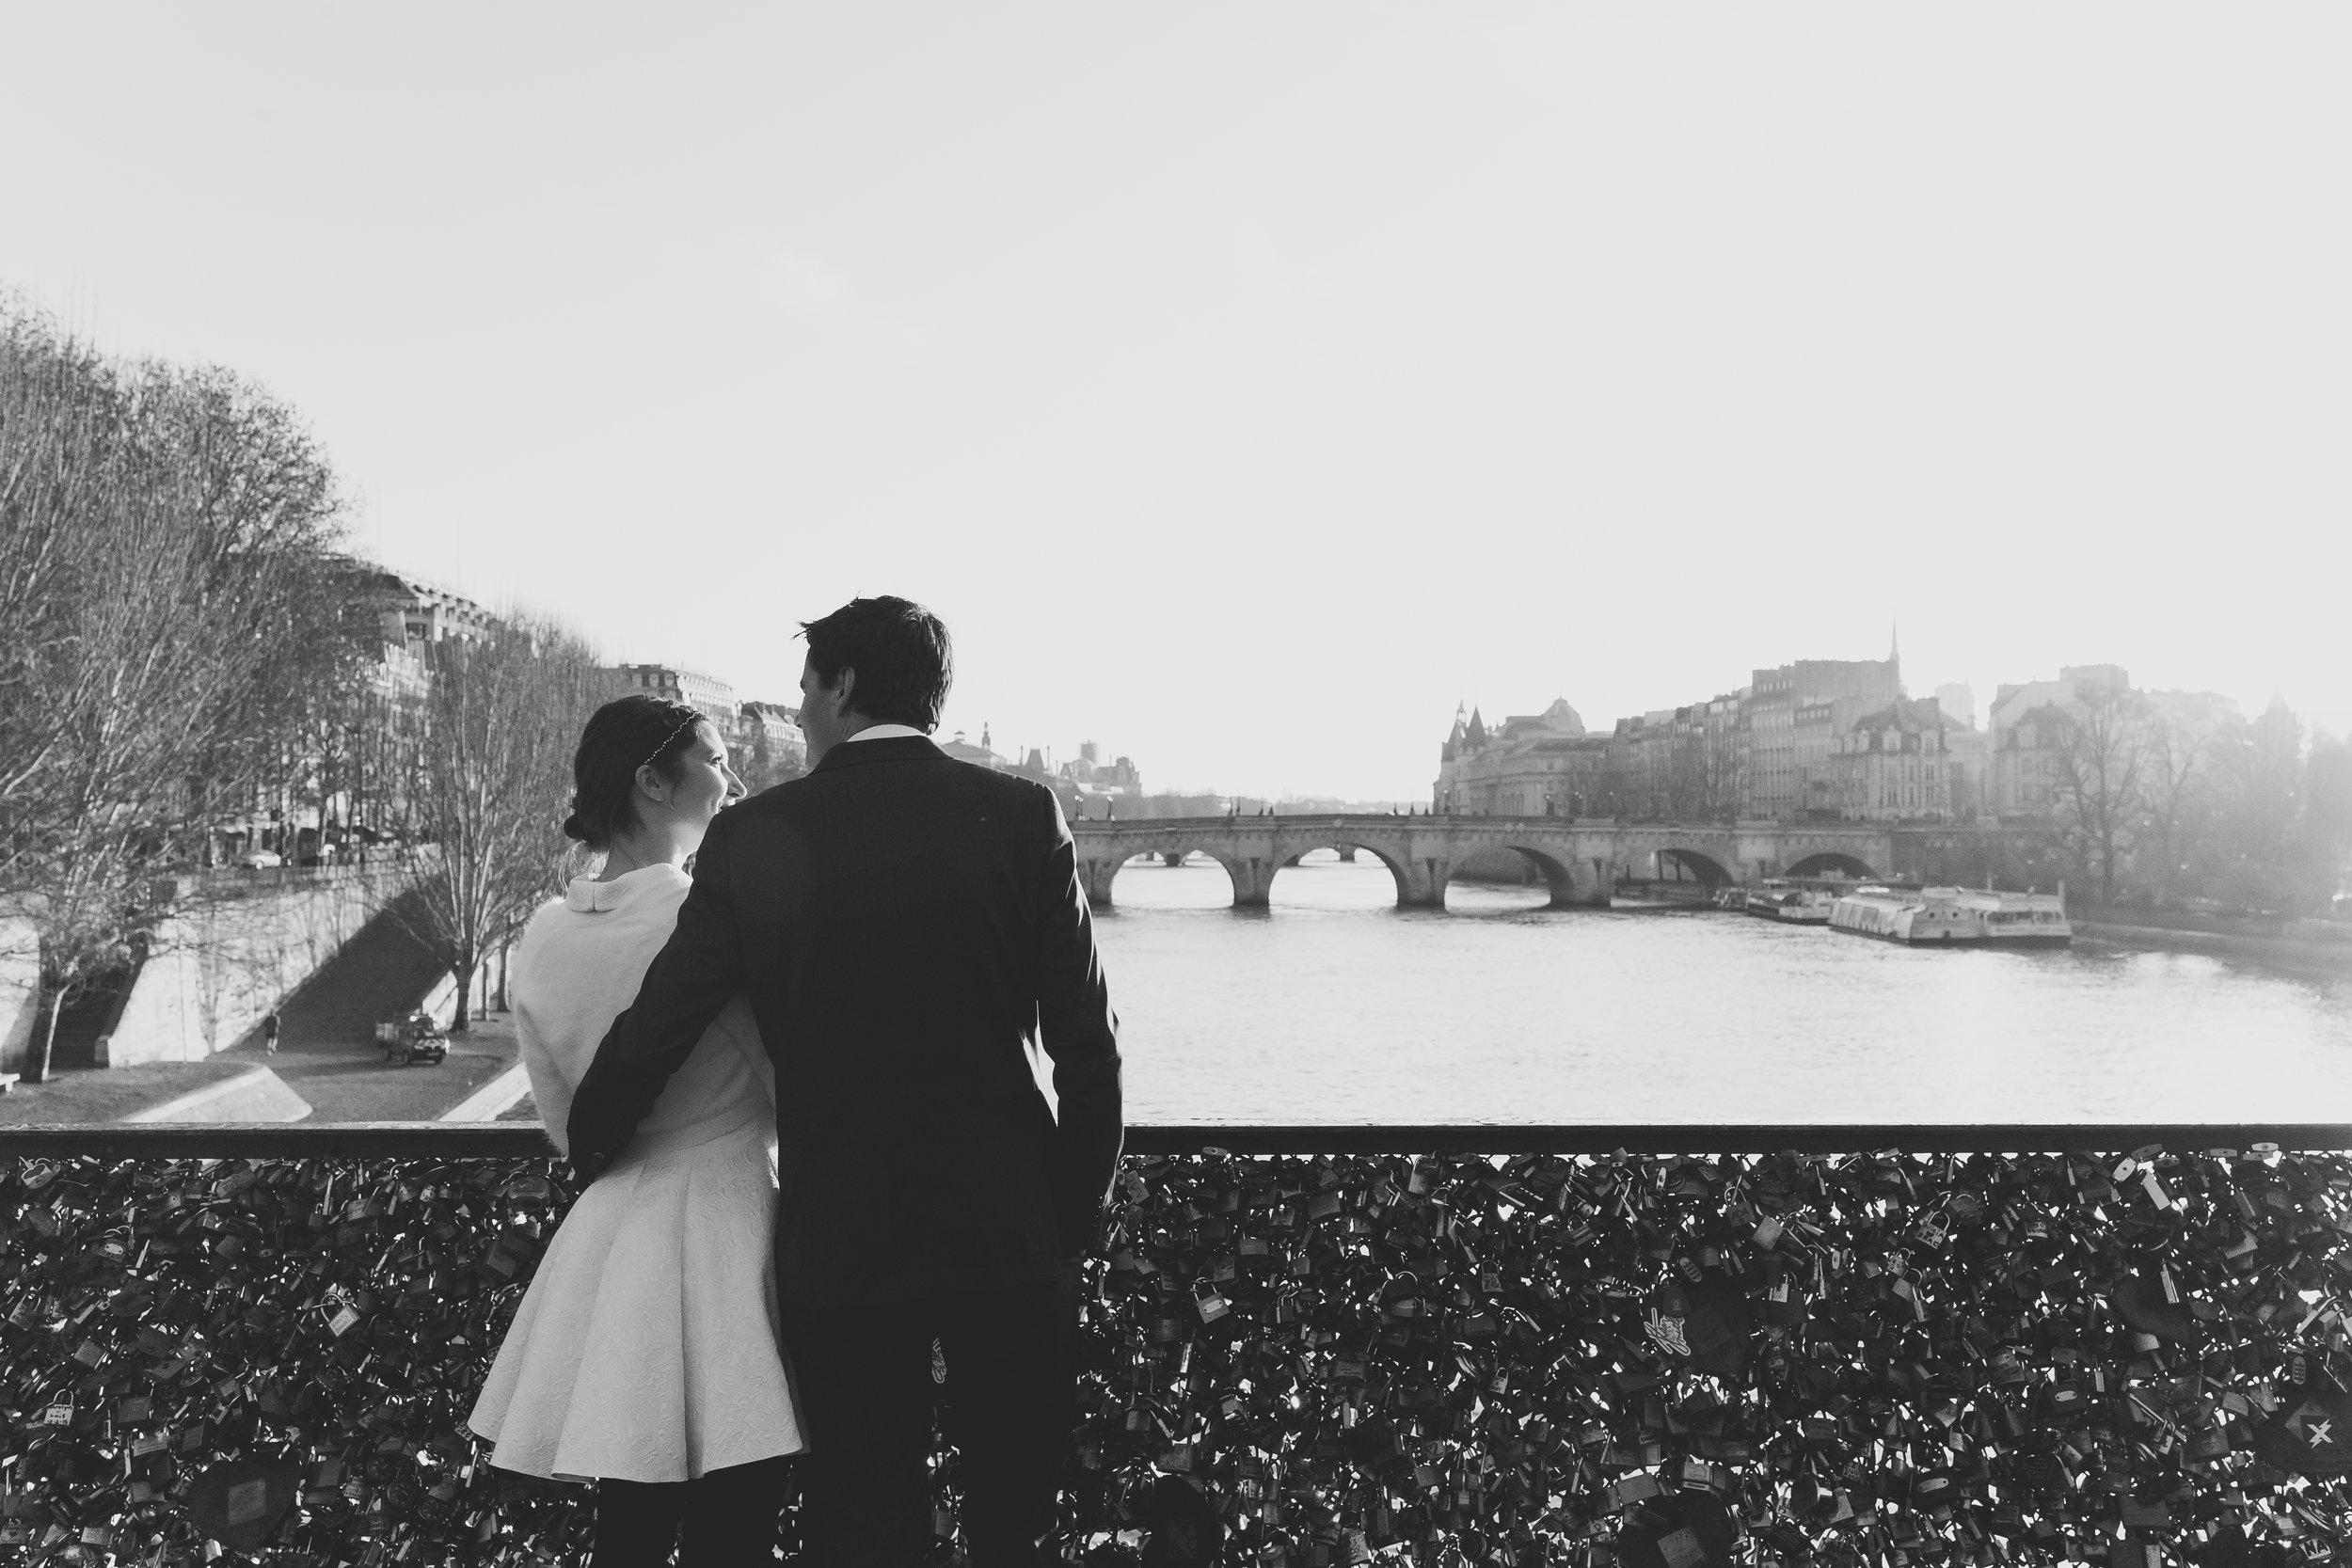 Séance engagement - HeleneBenoit - Paris -IMG_8145.jpg